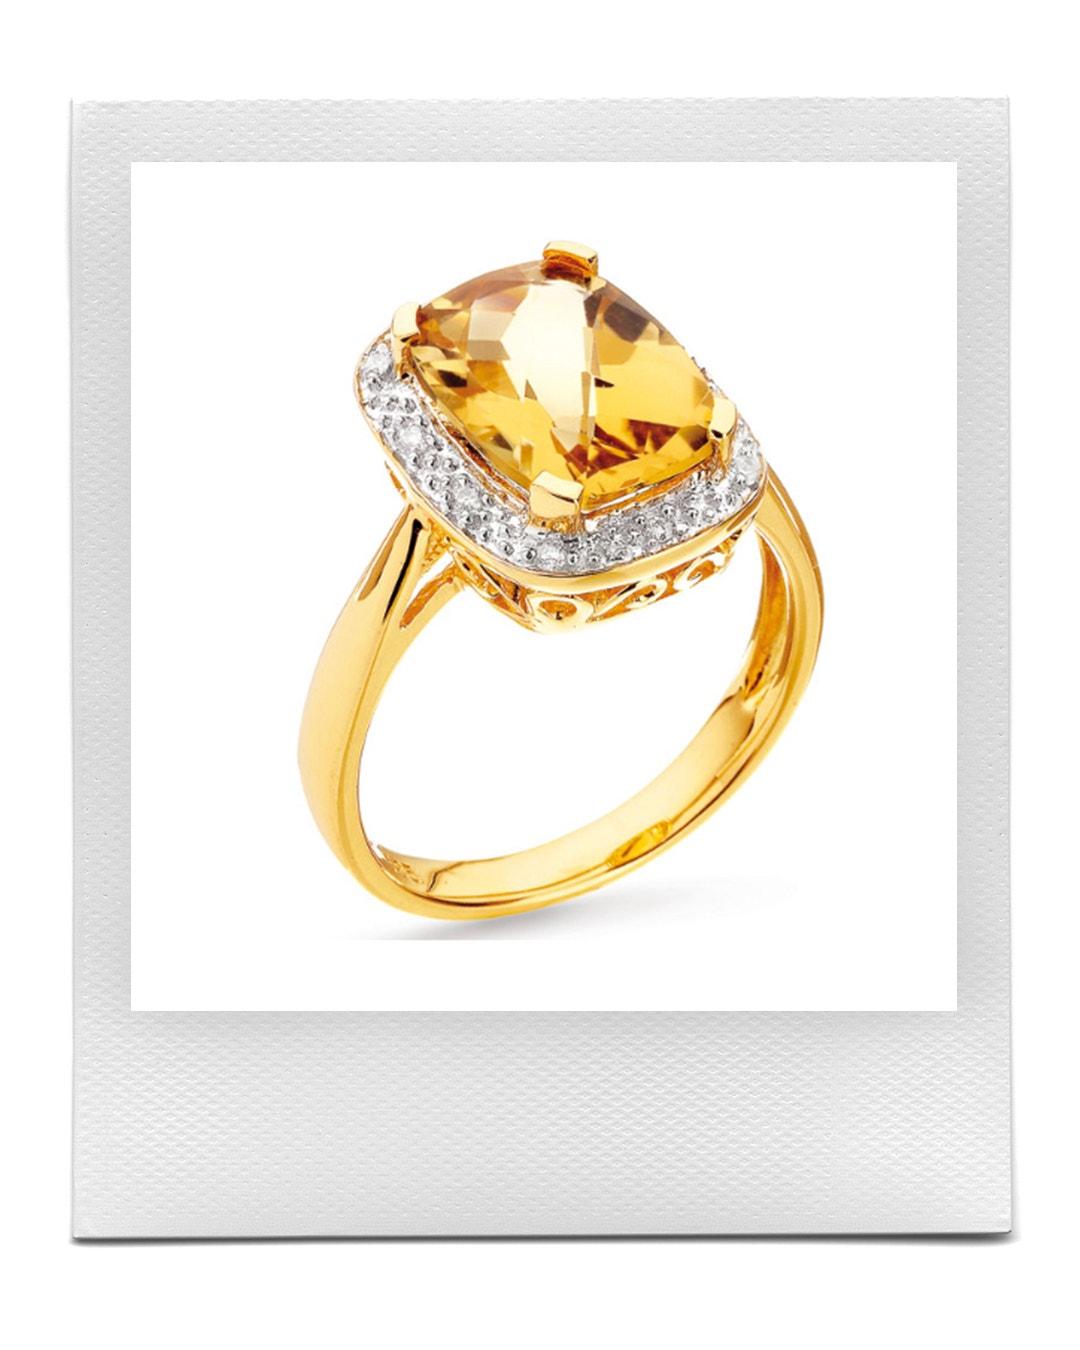 Prsten ze zlata s diamanty a citrínem, Apart  prodává Apart, 15 639 Kč